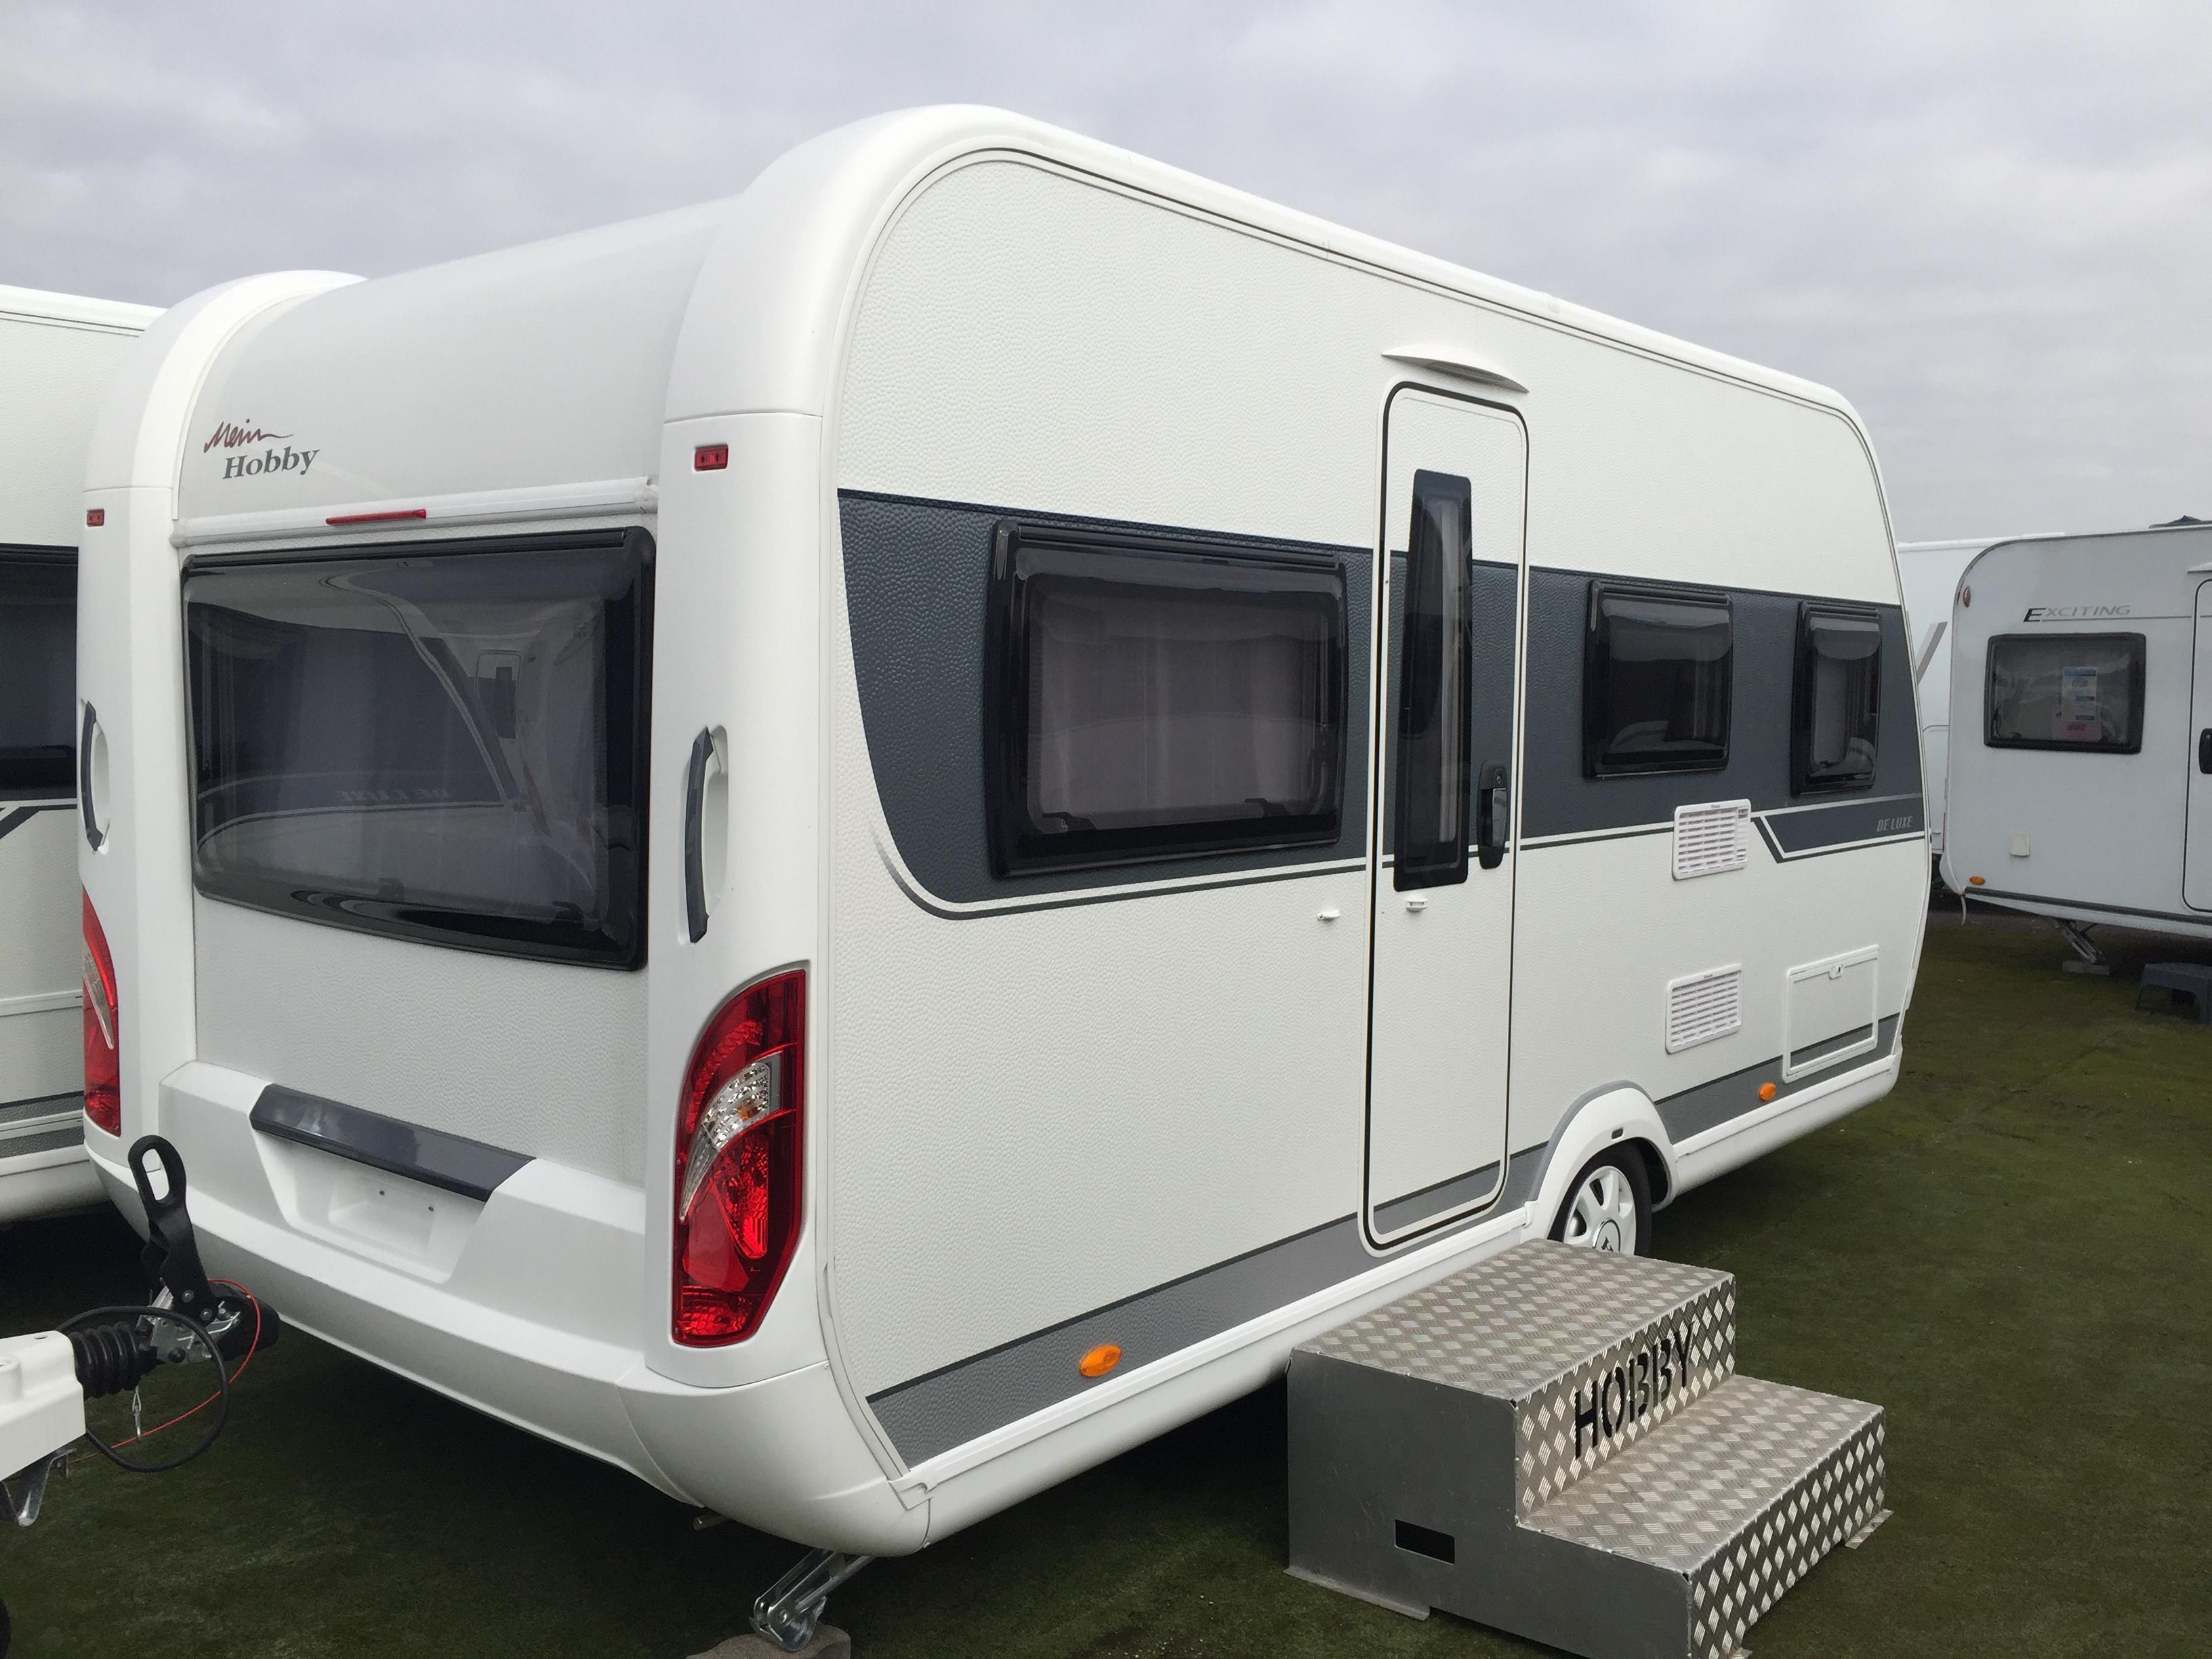 hobby 455 uf de luxe neuf caravane vendre en rhin 67 ref 9026 net campers. Black Bedroom Furniture Sets. Home Design Ideas